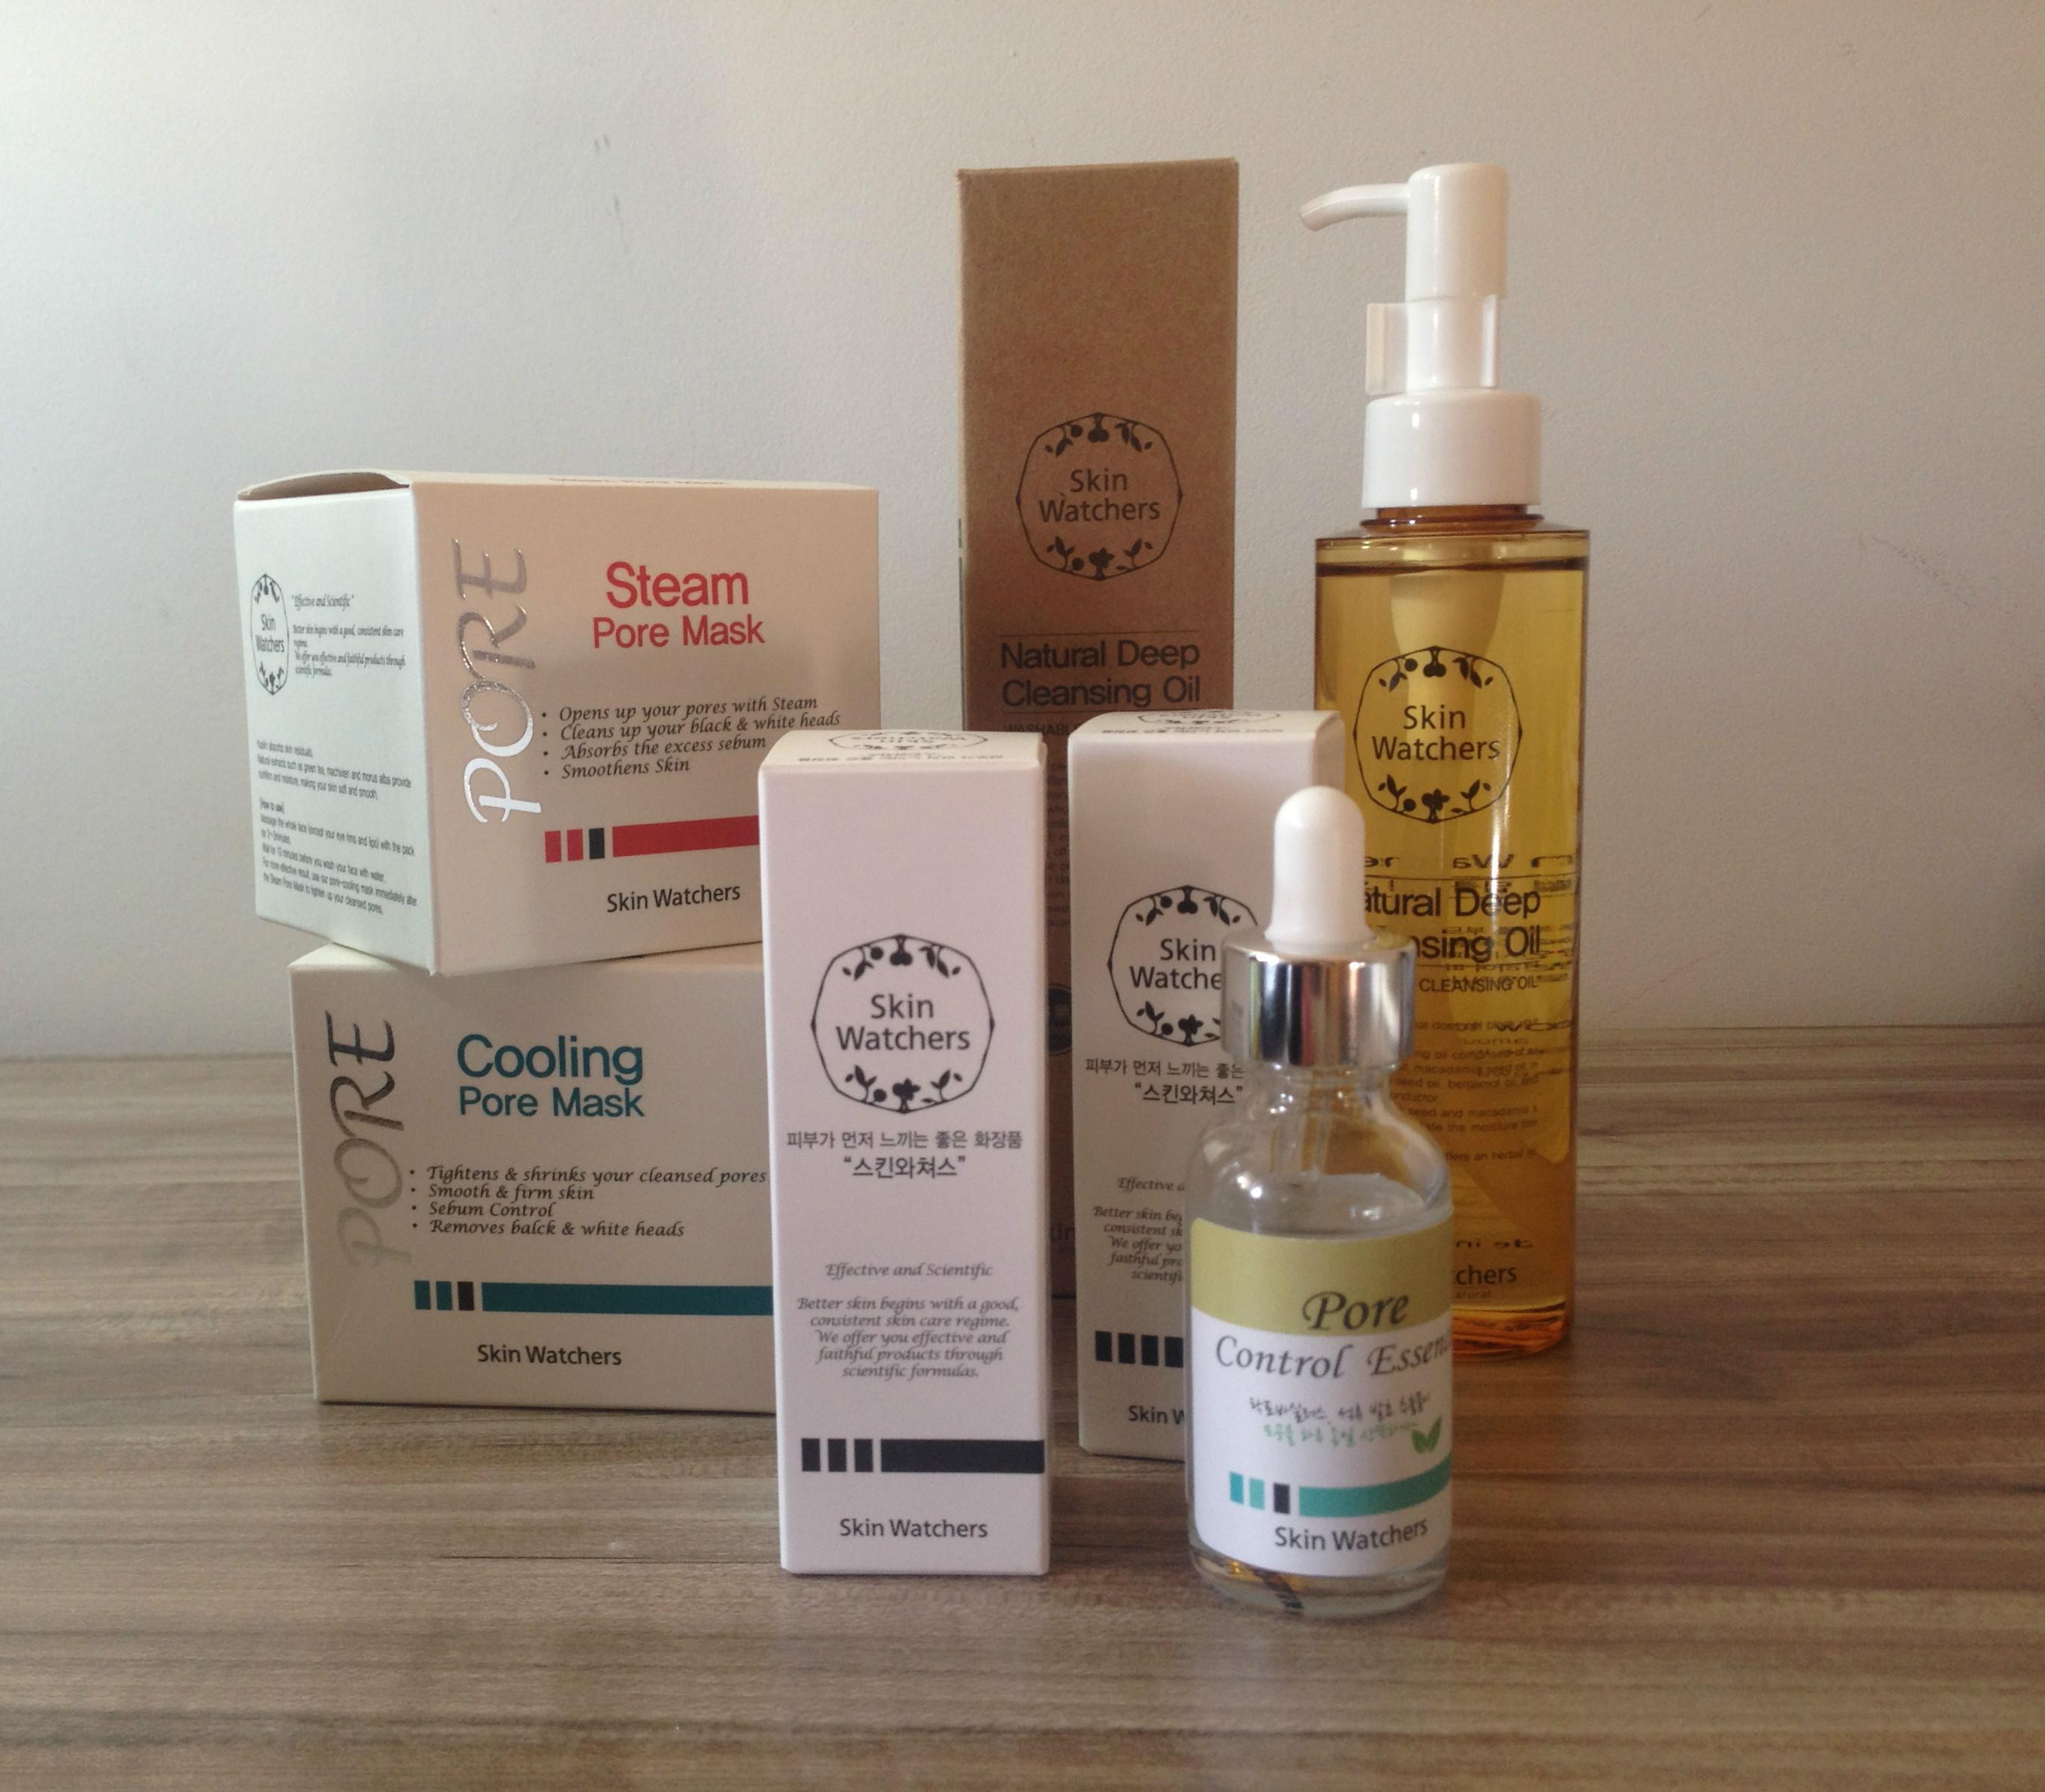 Skin Watchers   Steam e Cooling pore mask